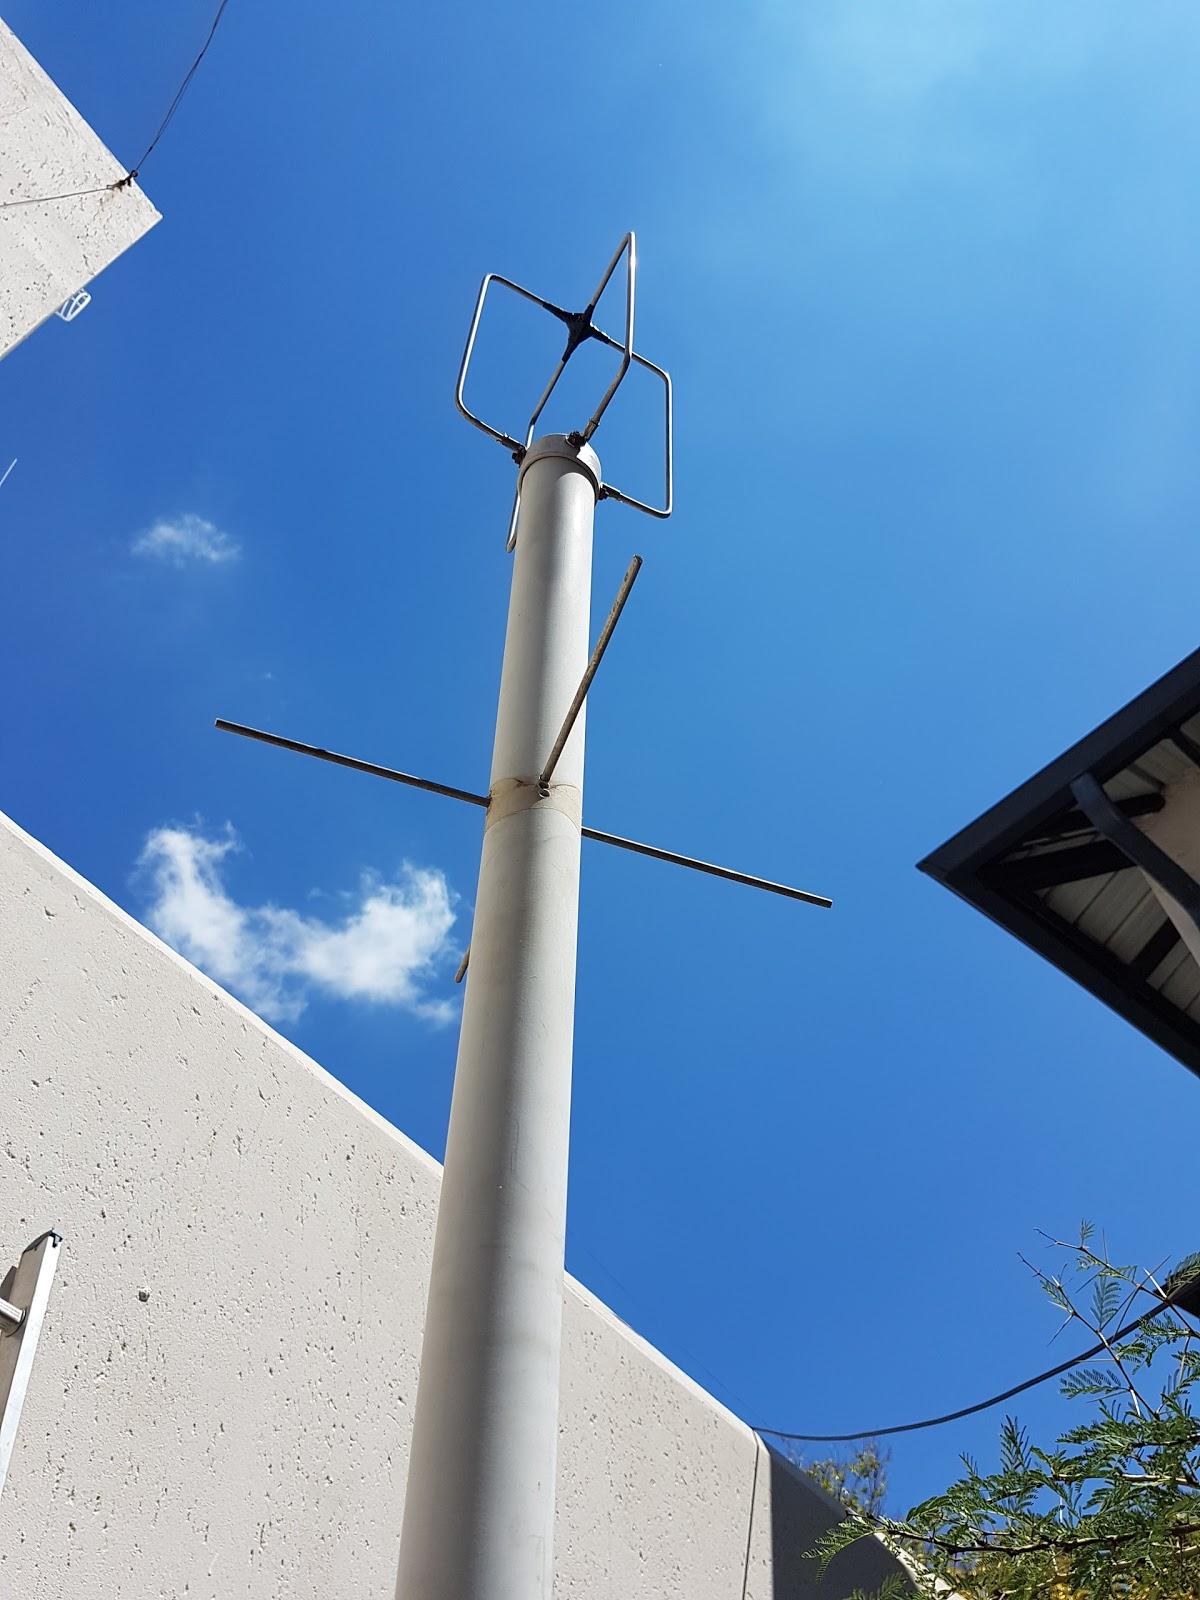 ZR6AIC: Building my Eggbeater II Omni LEO Antennas